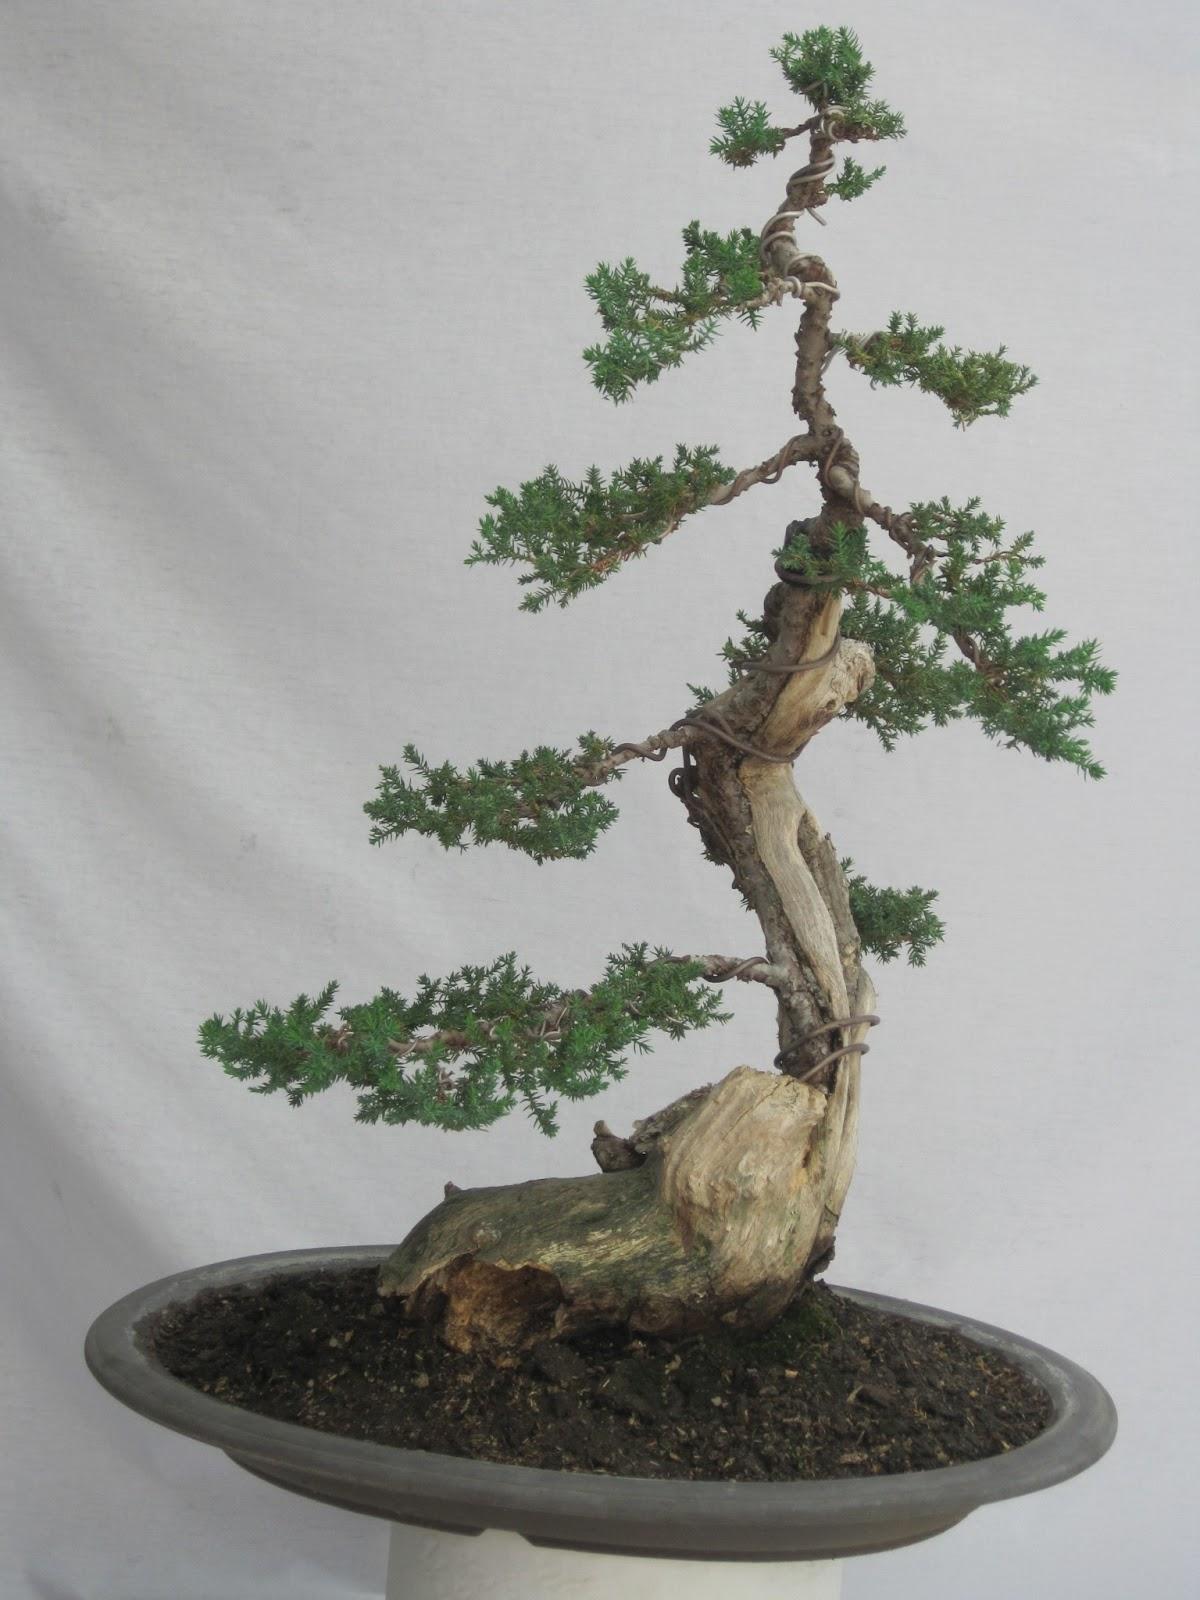 ShoChiku Bai Bonsai Club JUNE 2013 CURRENT BONSAI TREES FOR SALE